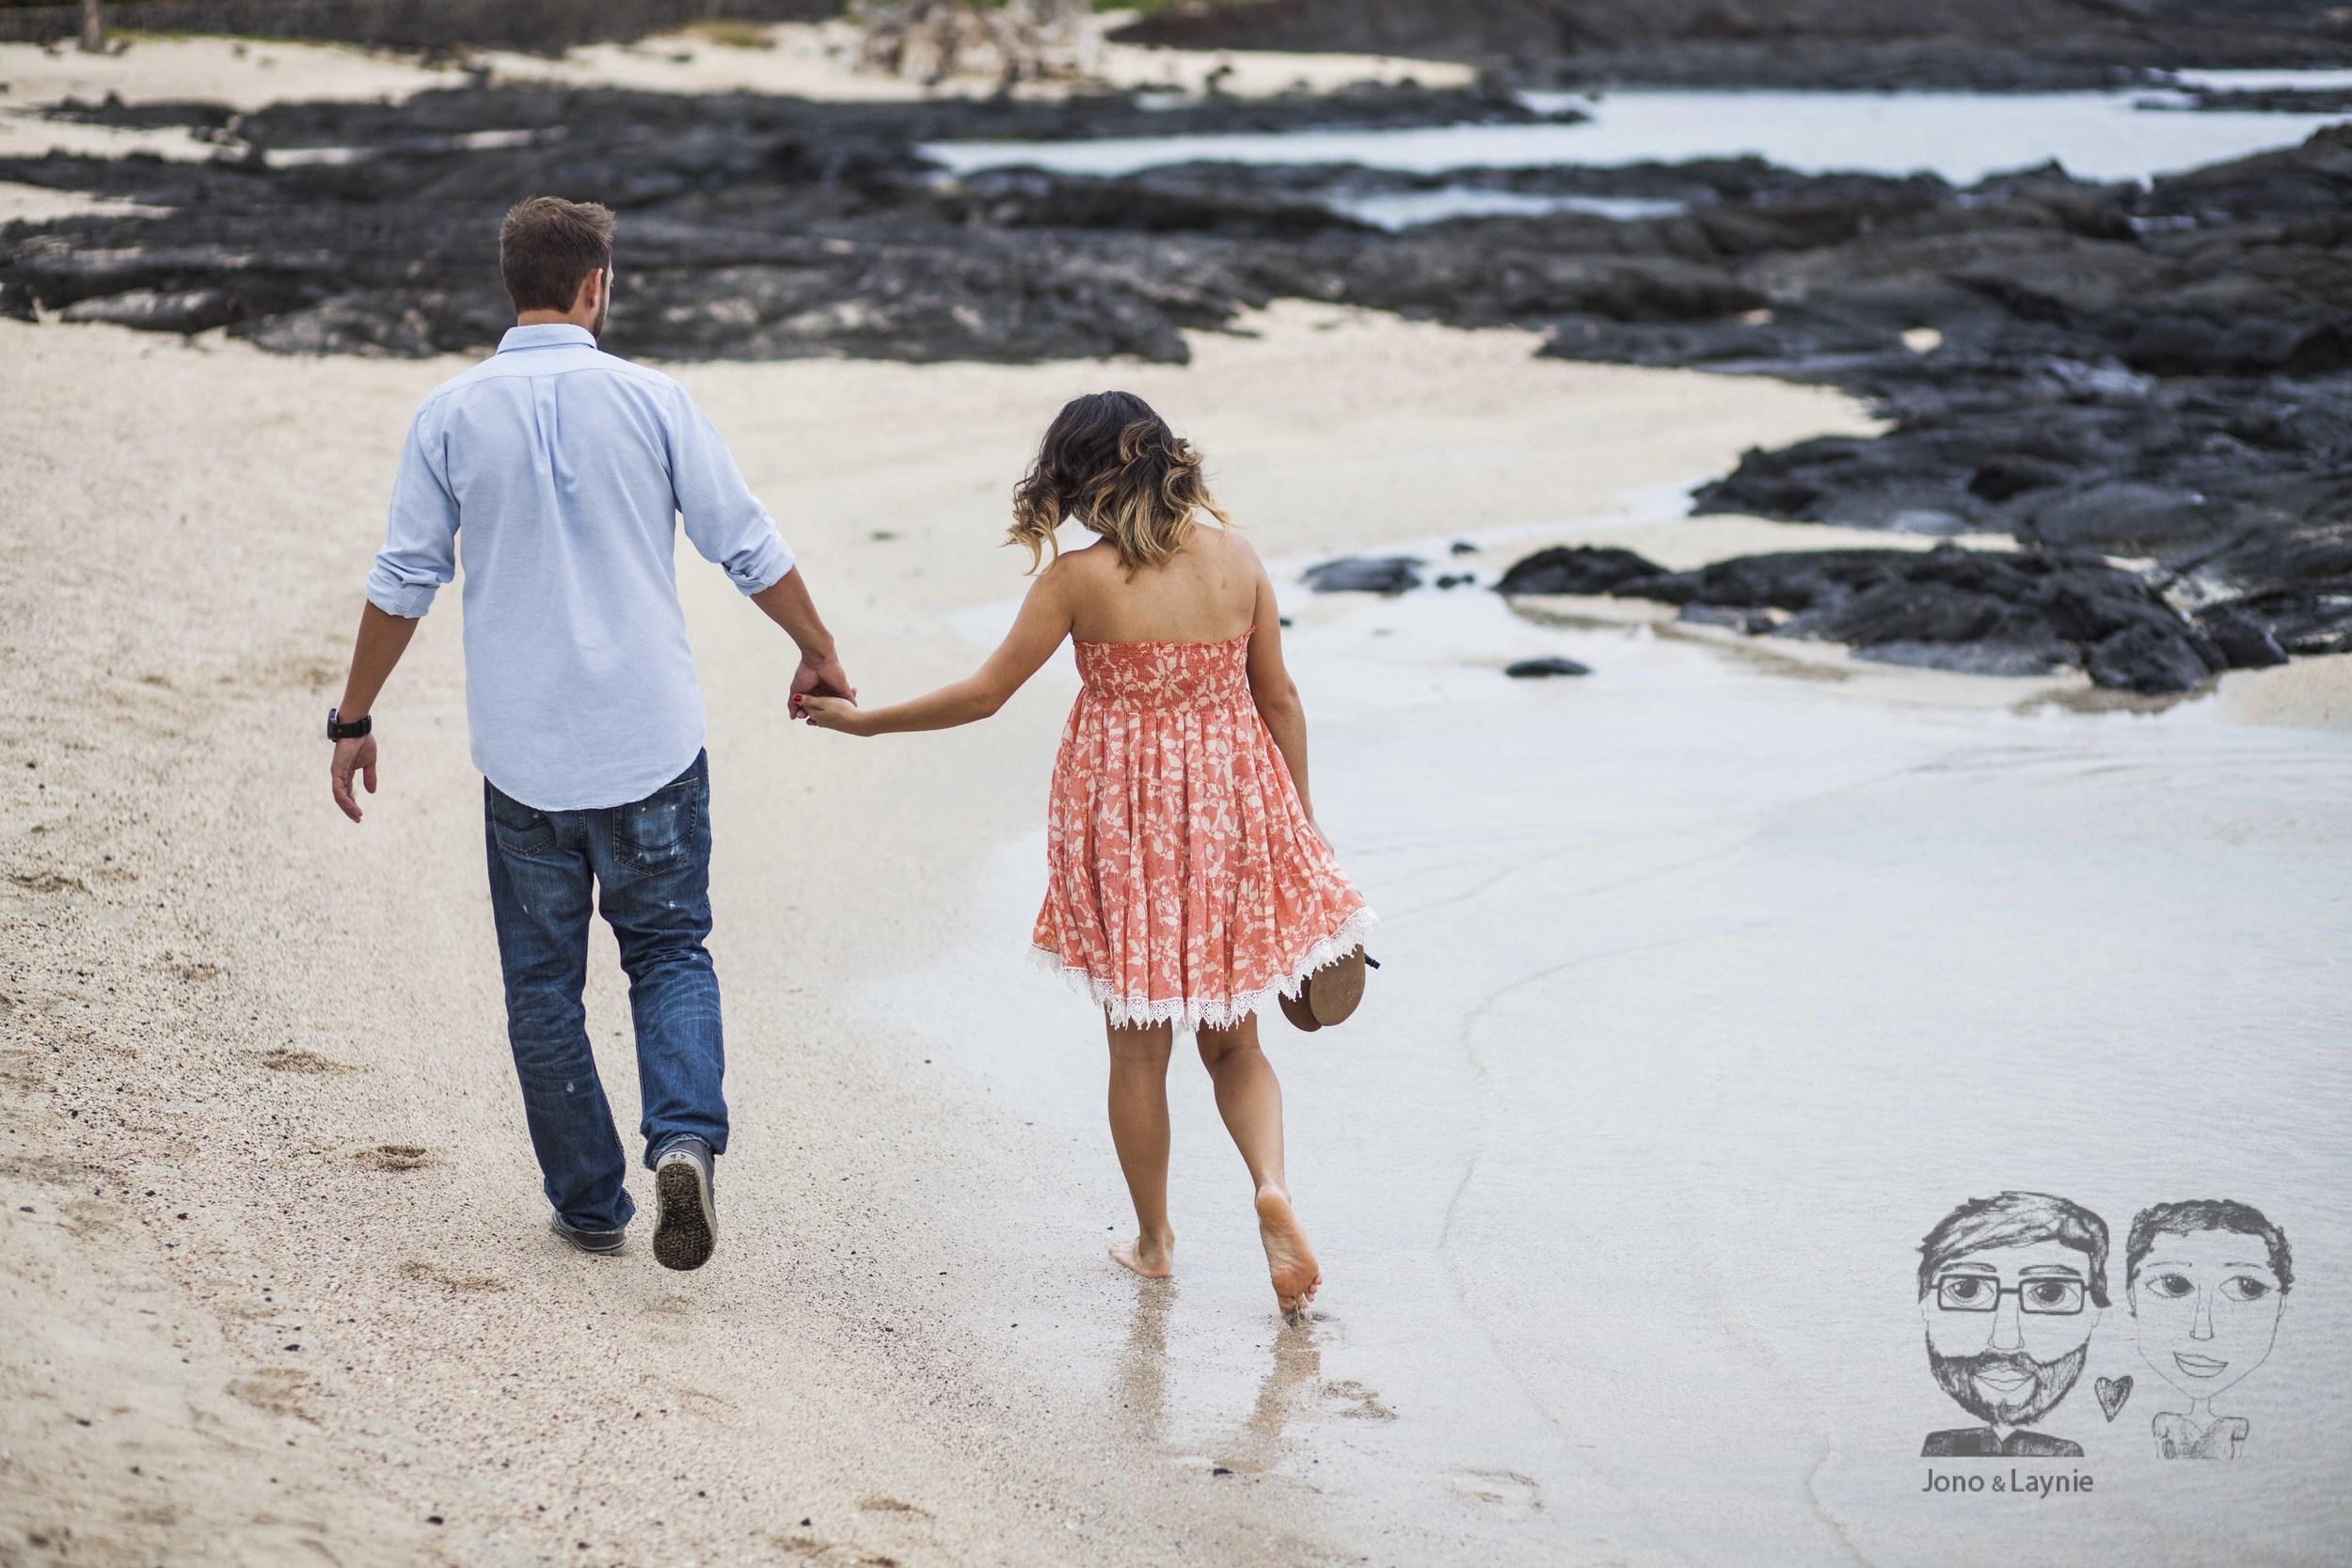 Jono & Laynie Co.-Kona, Hawaii-Engagement Session19.jpg